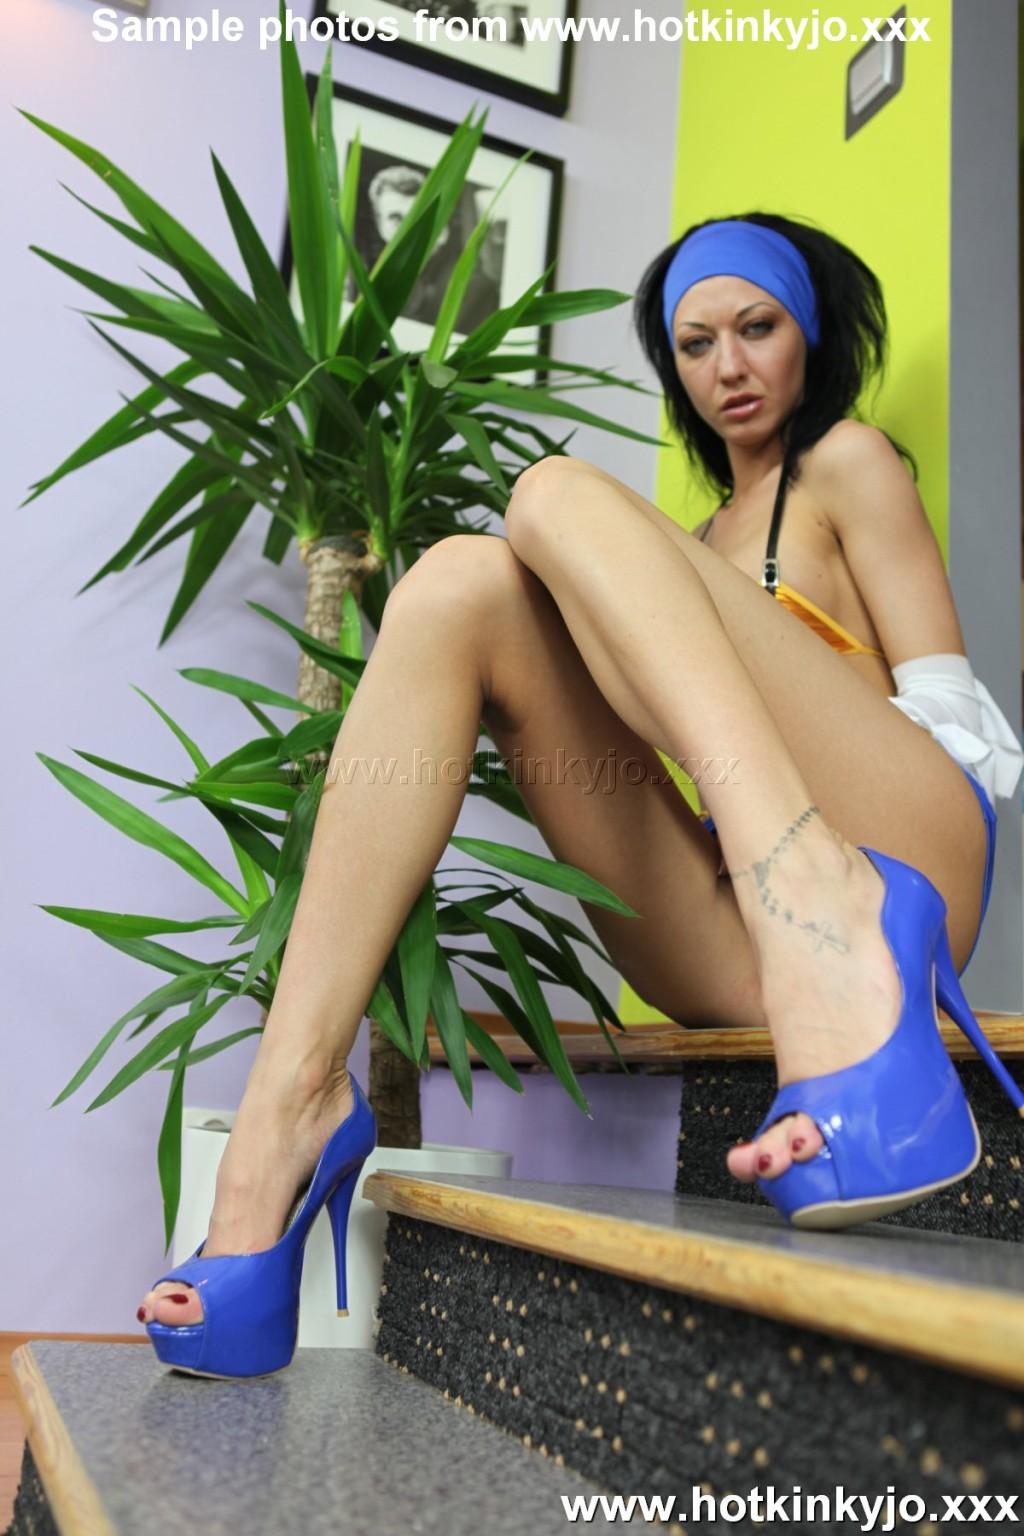 Rosaleen young spank my bottom